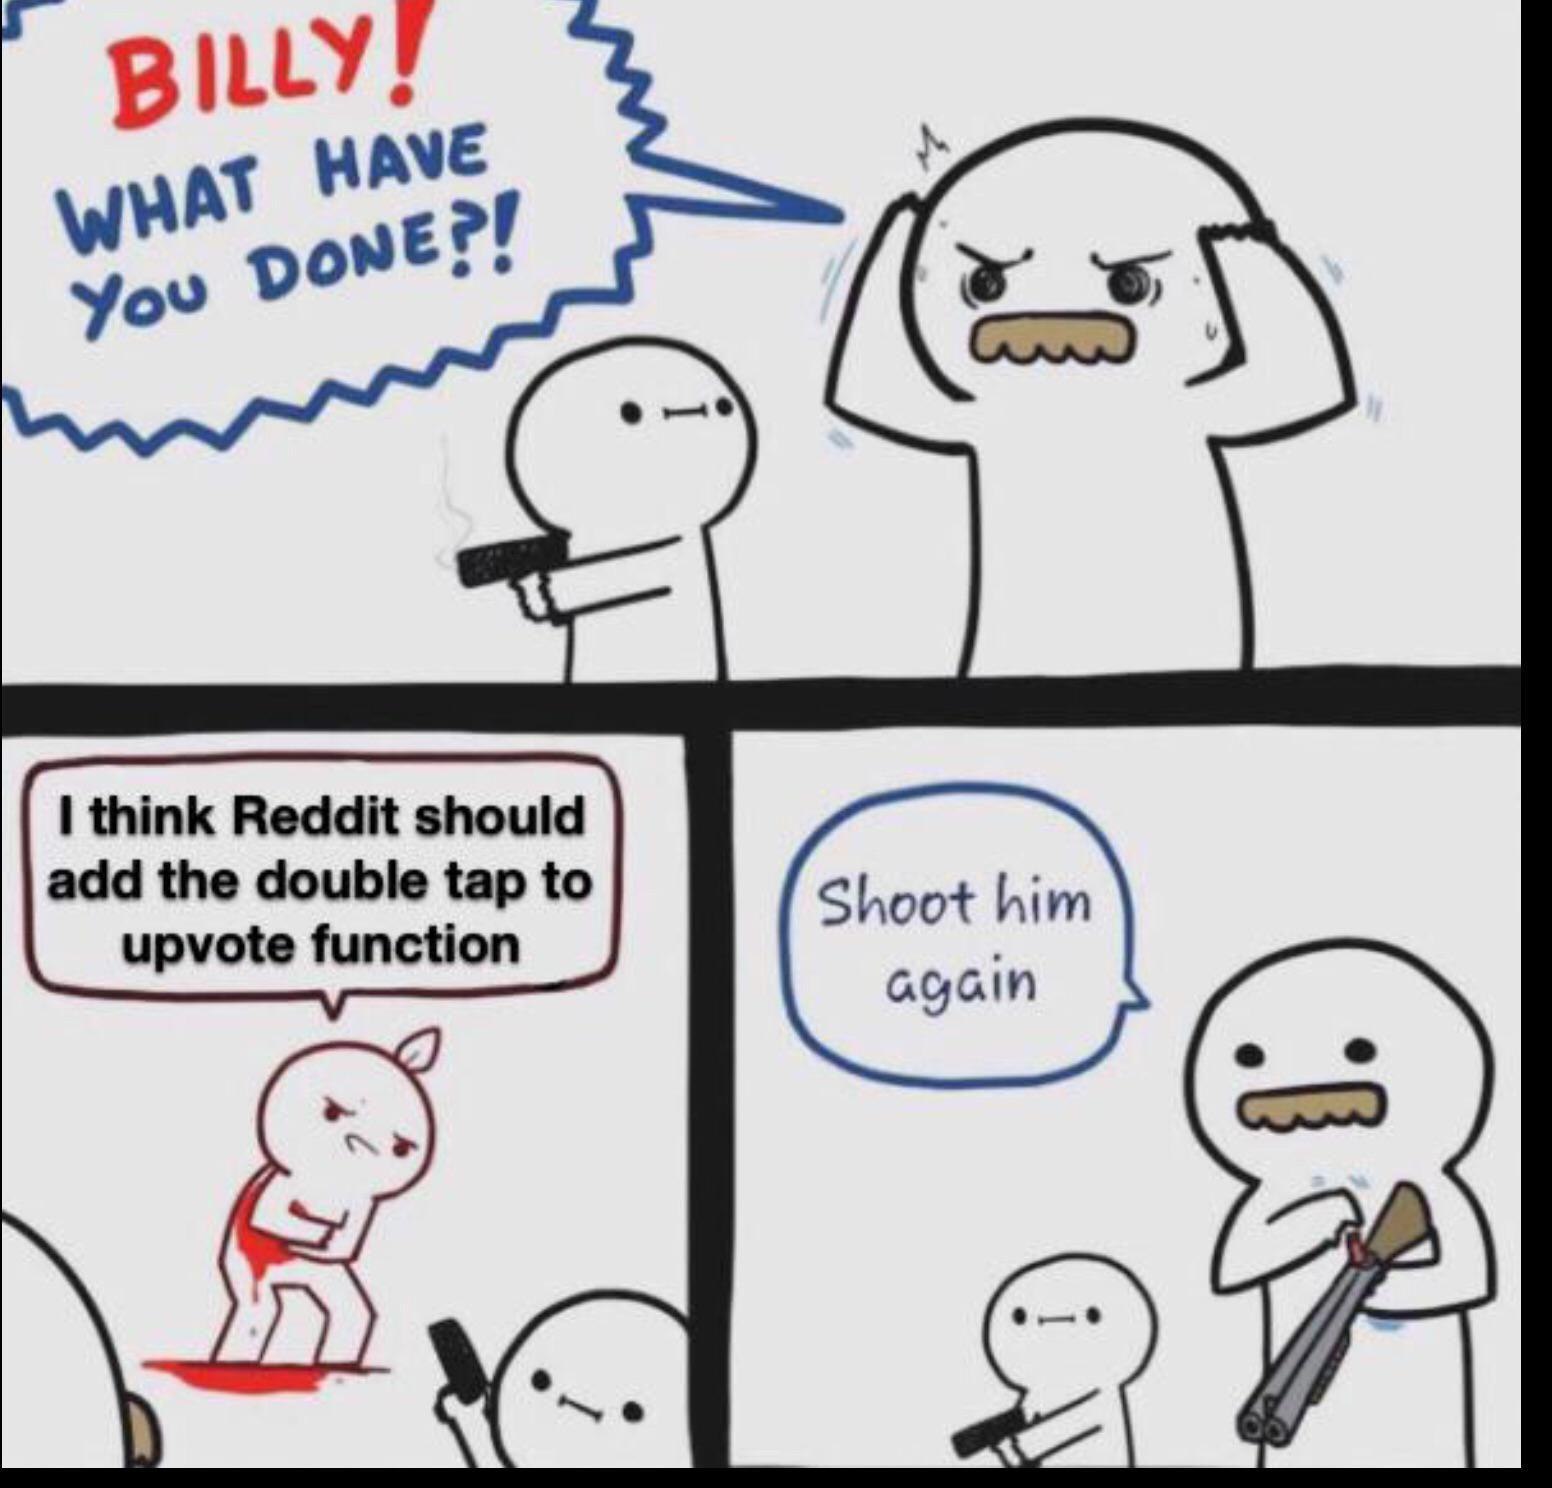 Billy kill him